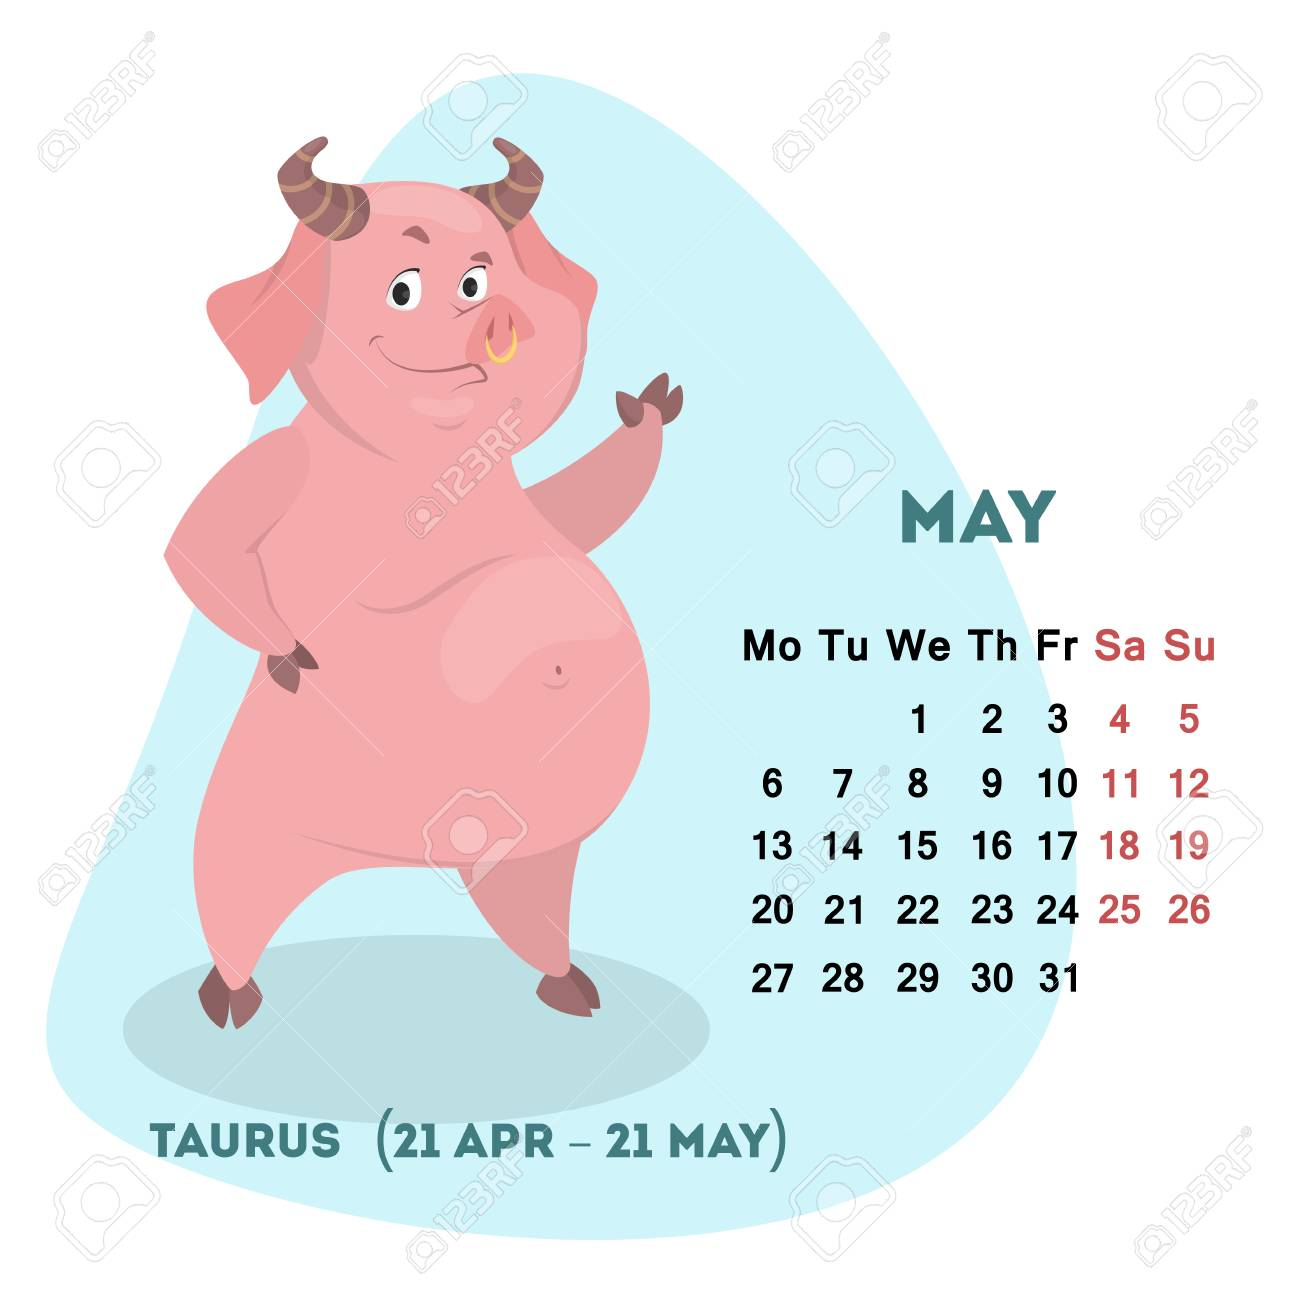 horoscope calendar - Garaj cmi-c org